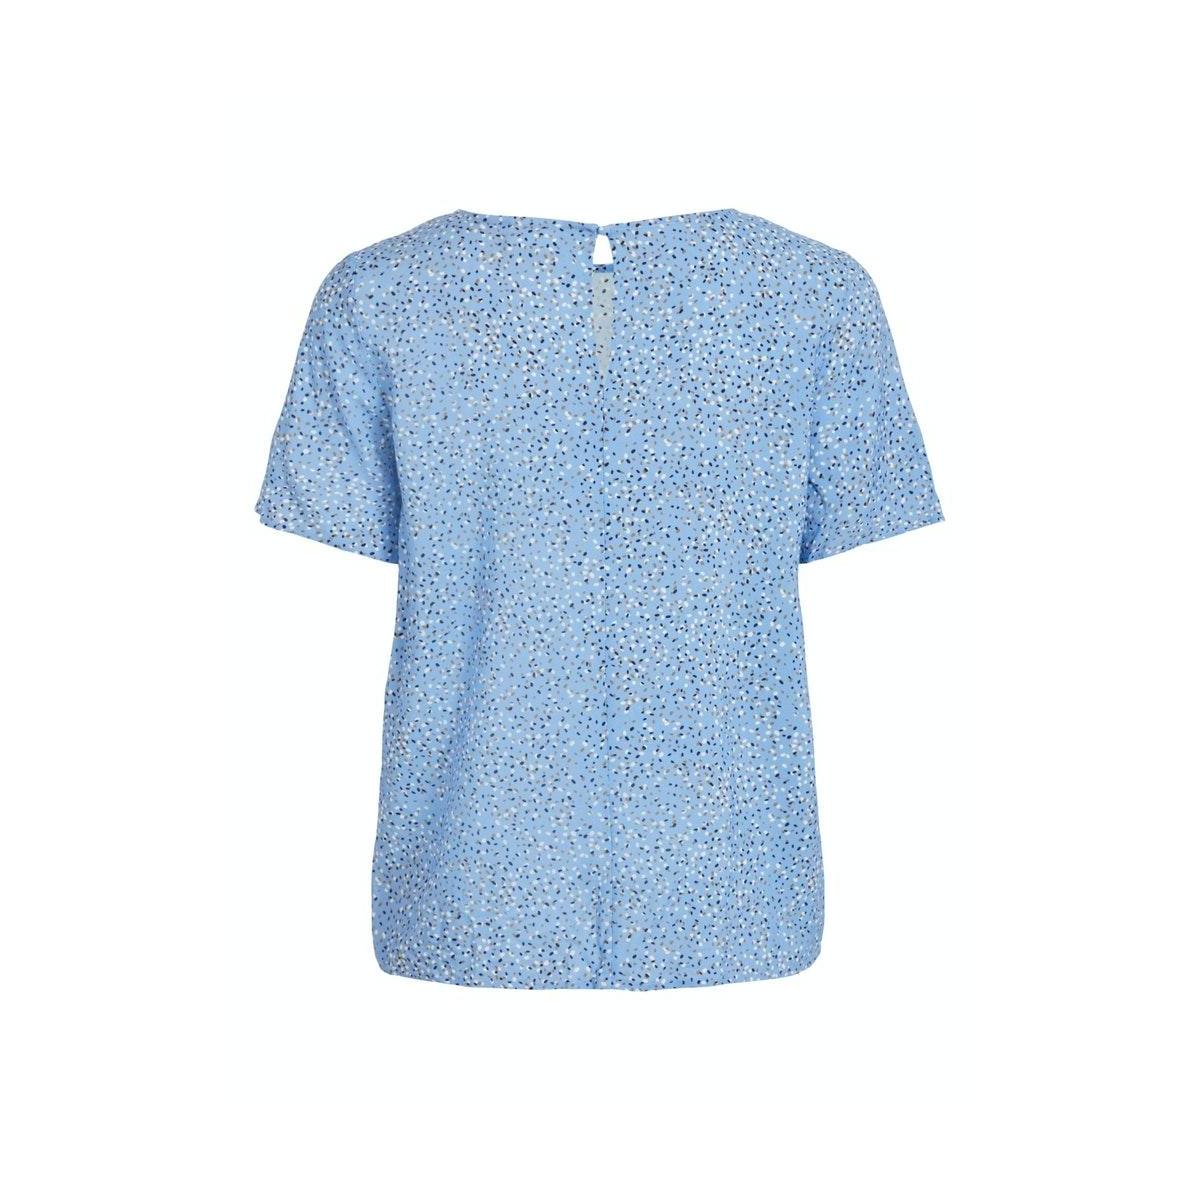 vipaddina s/s straight top /su dk 14059850 vila t-shirt provence/dots